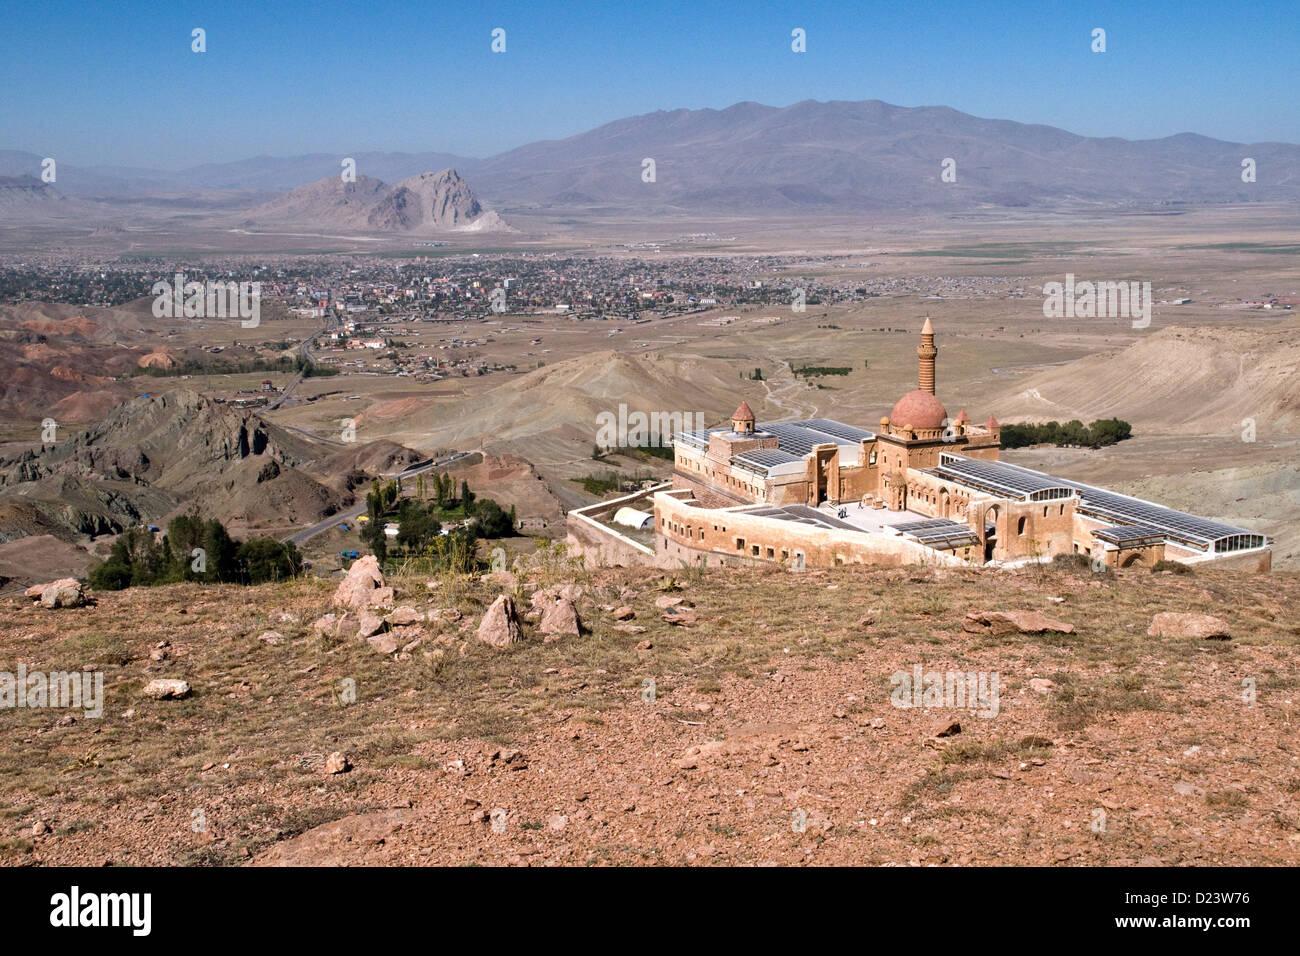 The 18th century Ottoman Ishak Pasha Palace overlooking the city of Dogubeyazit in the eastern Anatolia region of Turkey. Stock Photo